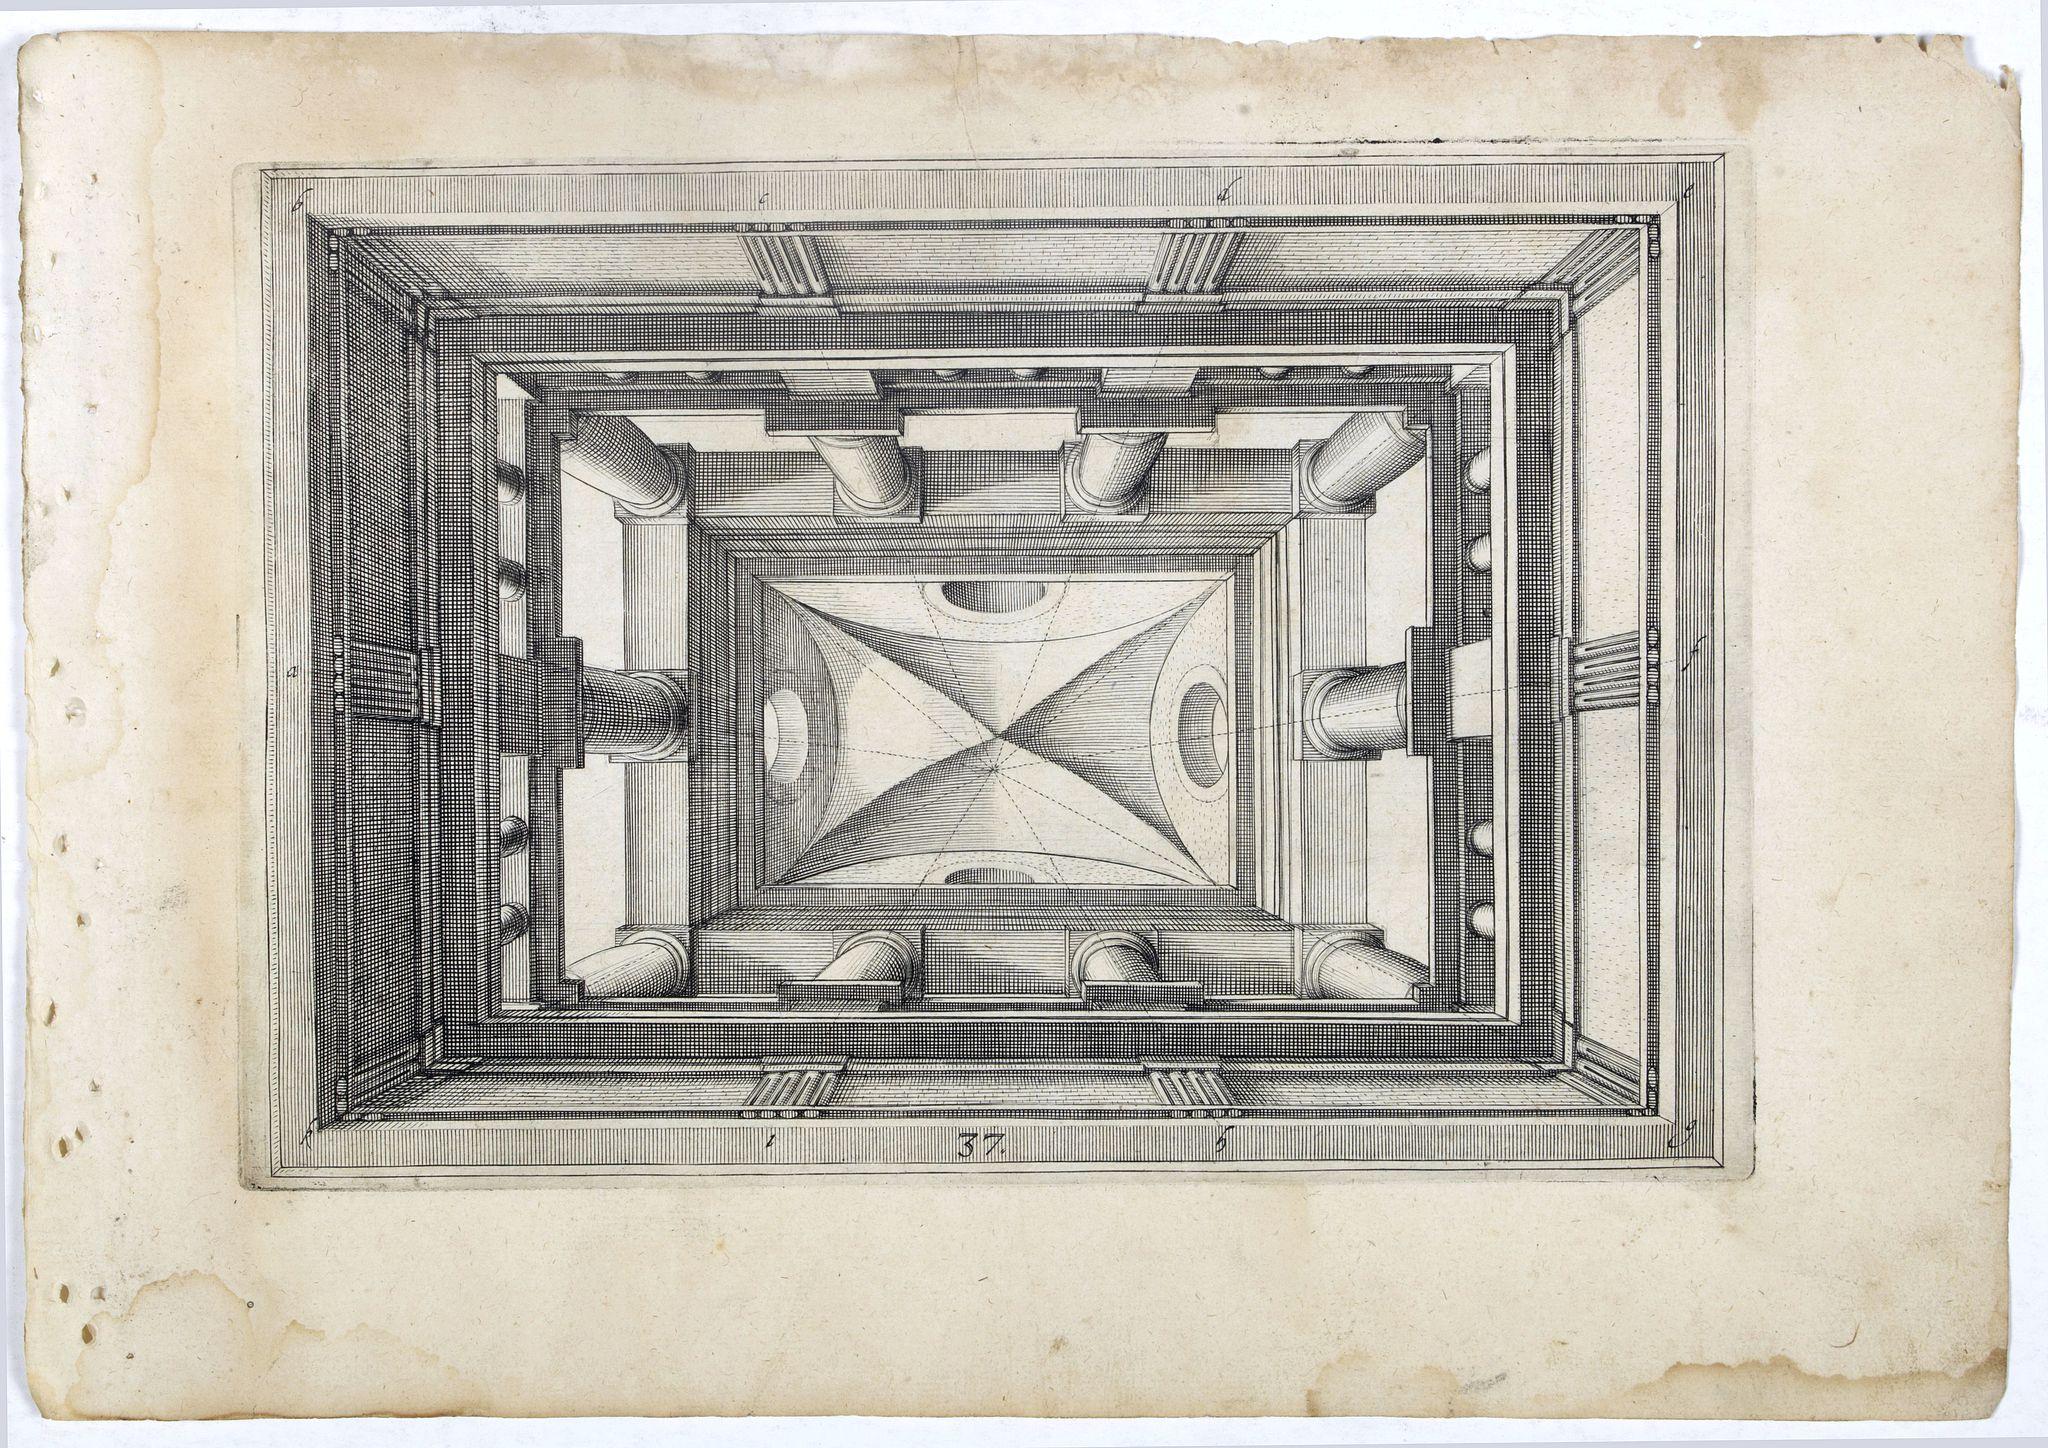 VREDEMAN DE VRIES, J. / HONDIUS, H. -  Perspective print by Vredeman de Vries. 37.